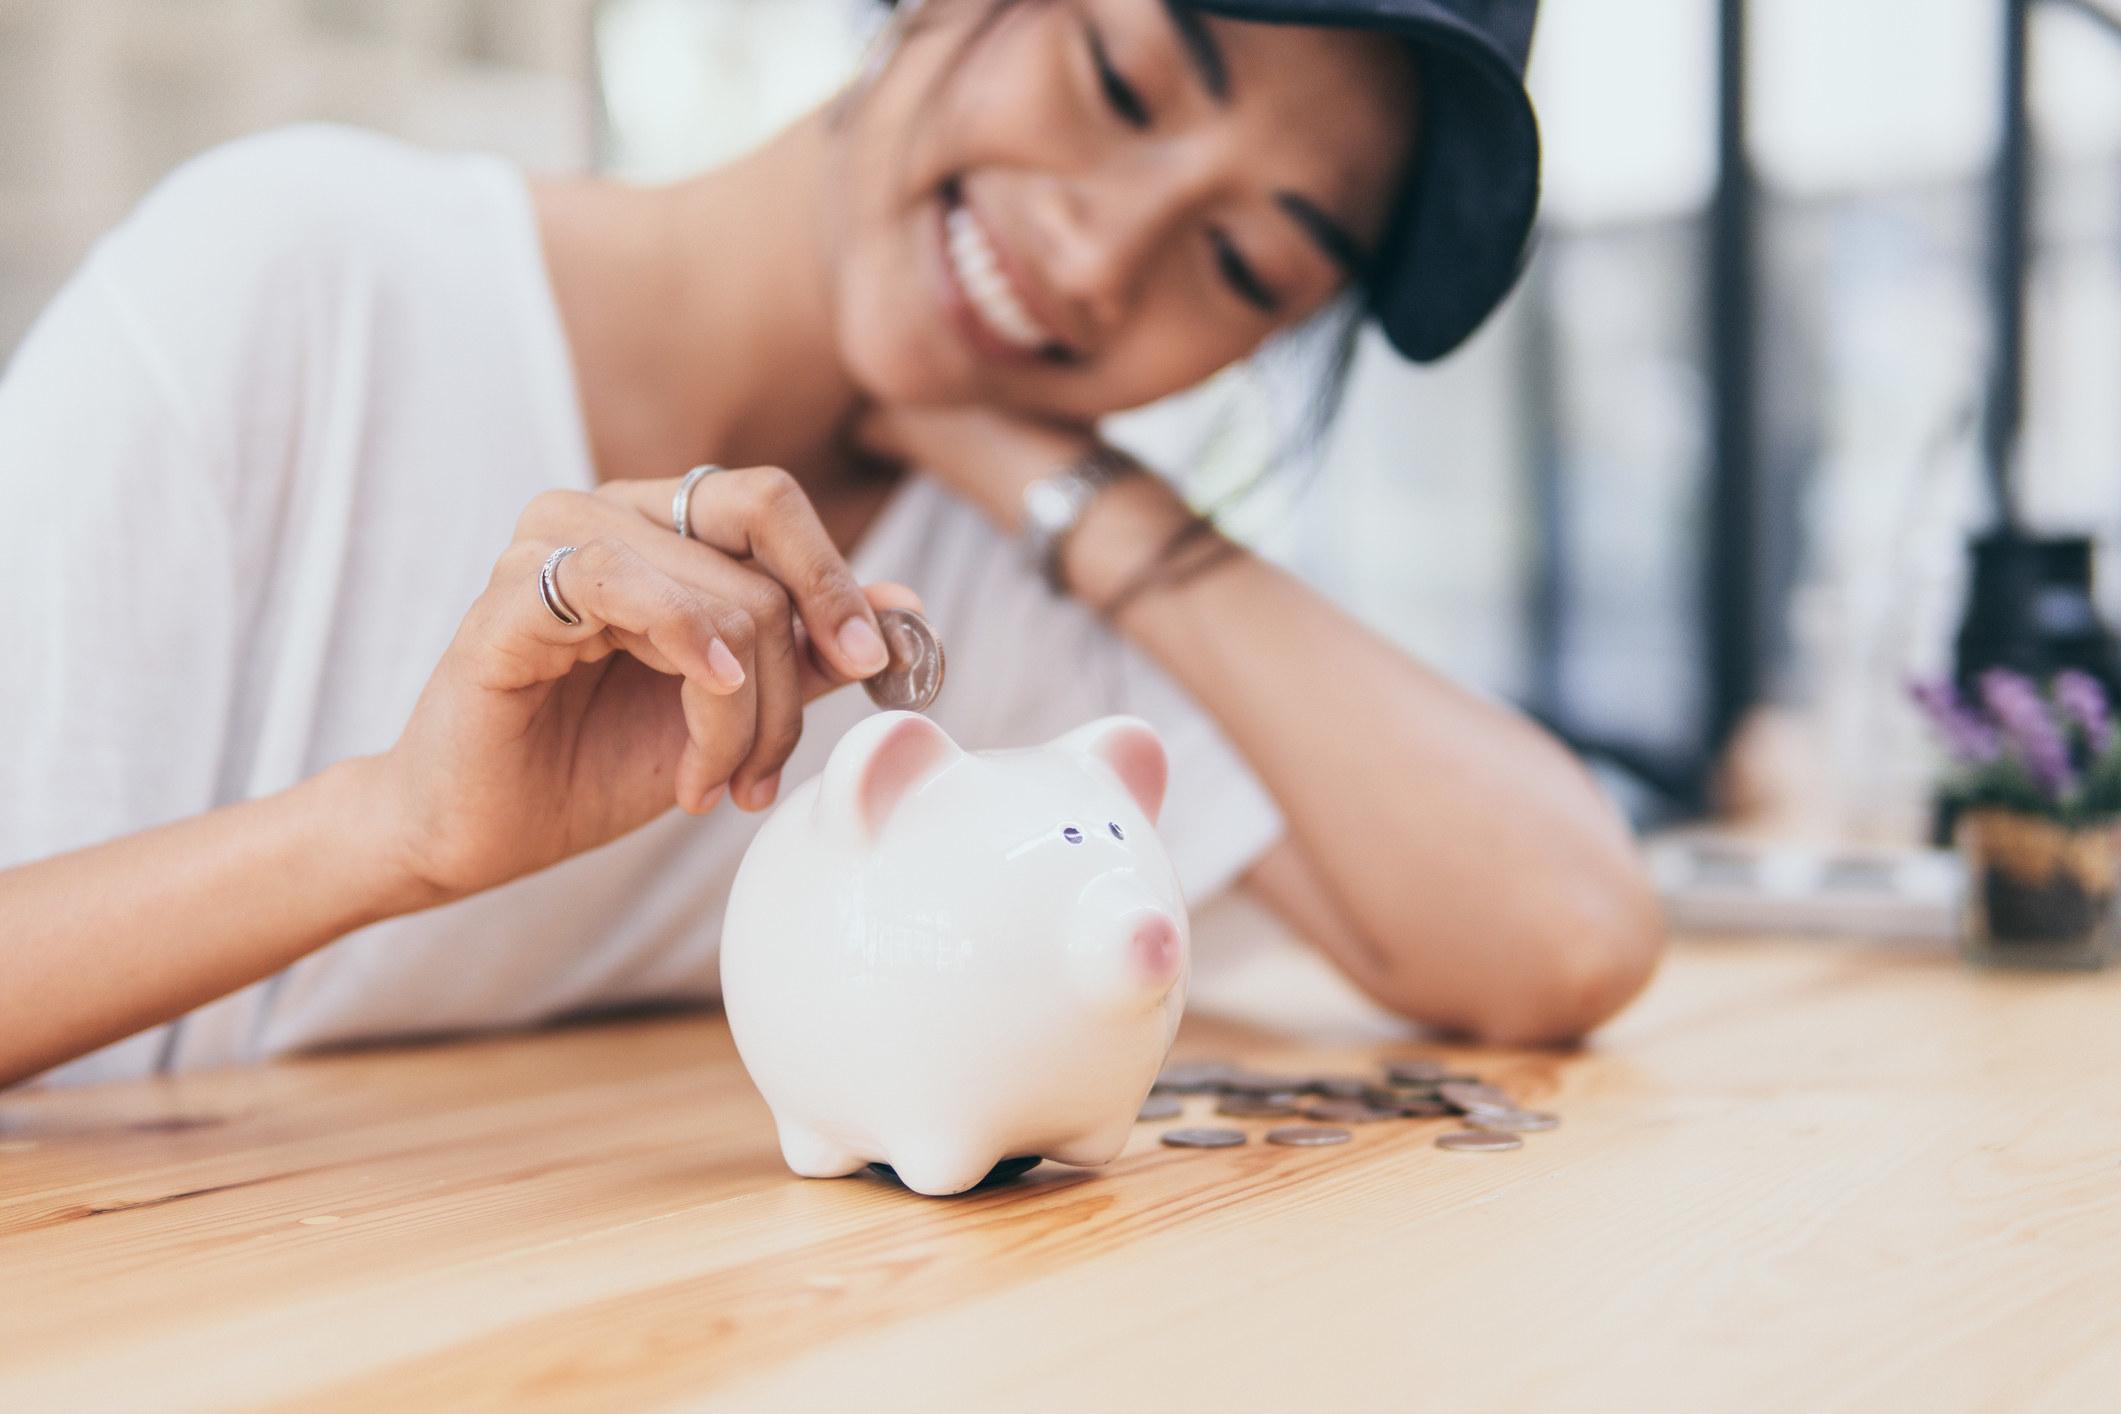 Model putting money into a piggy bank